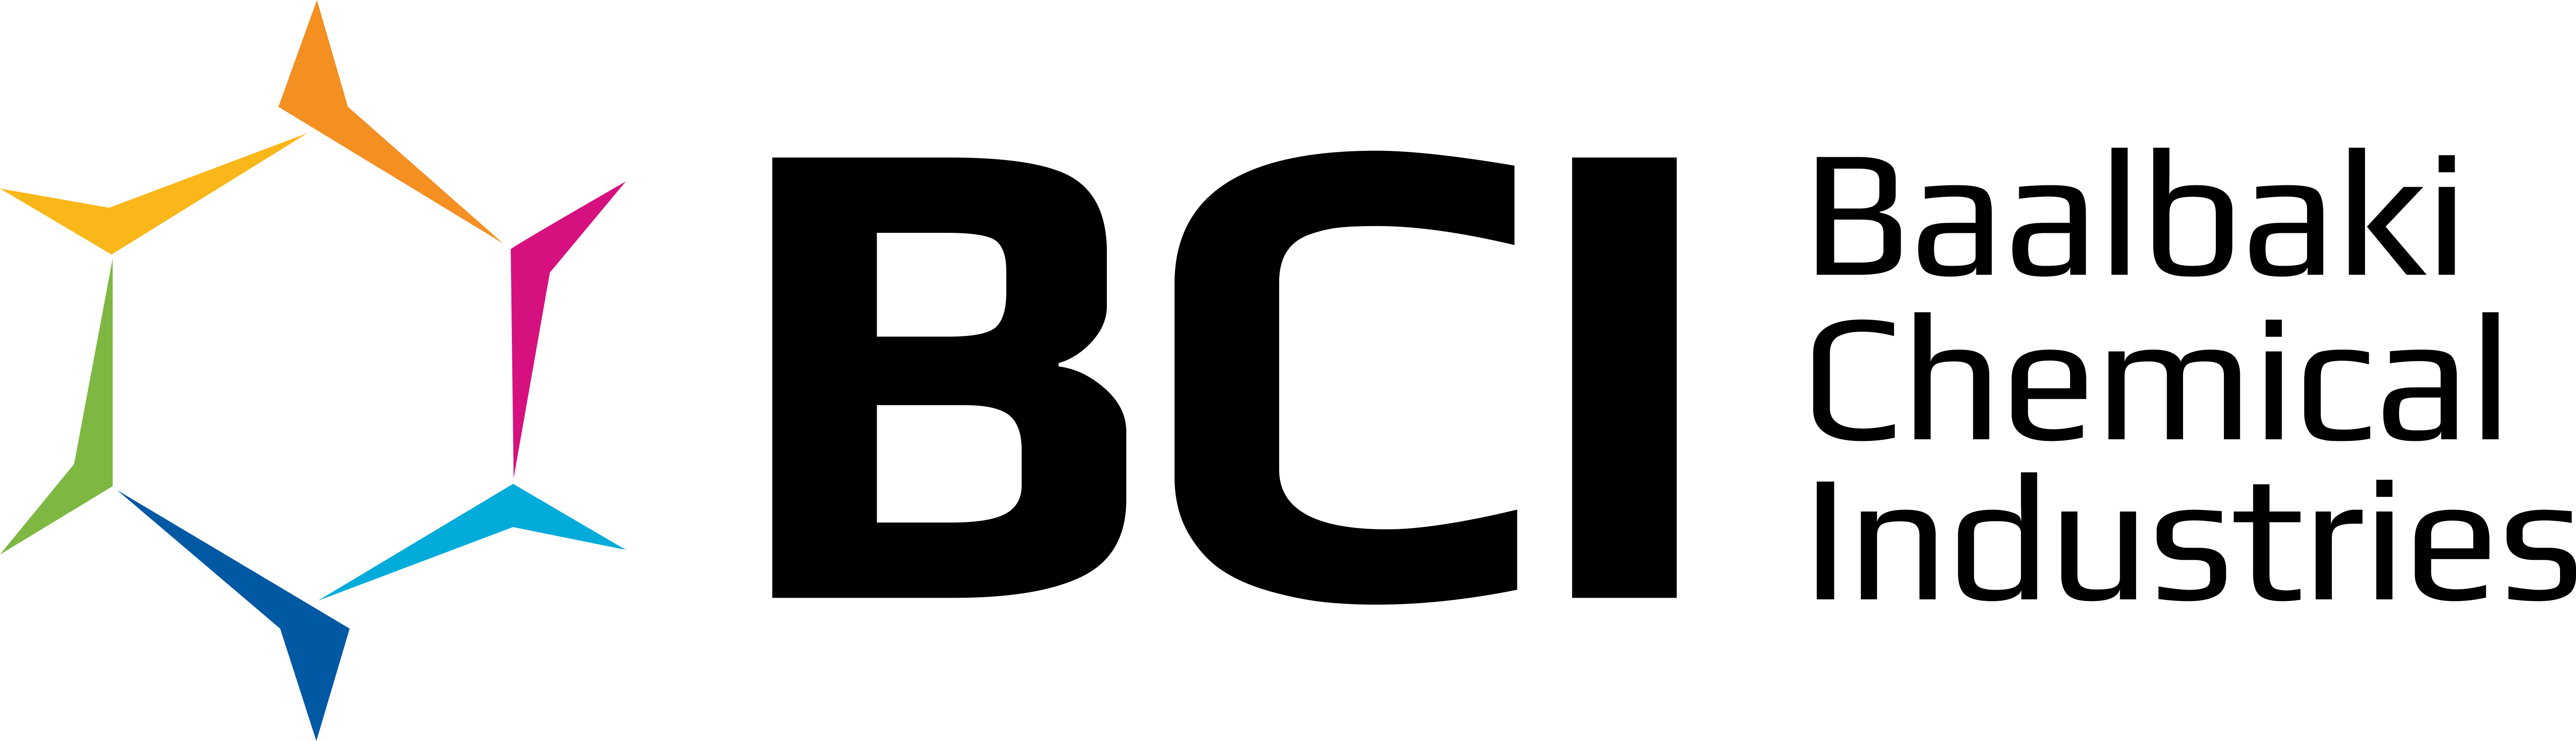 BCI (Baalbaki Chemical Industries)